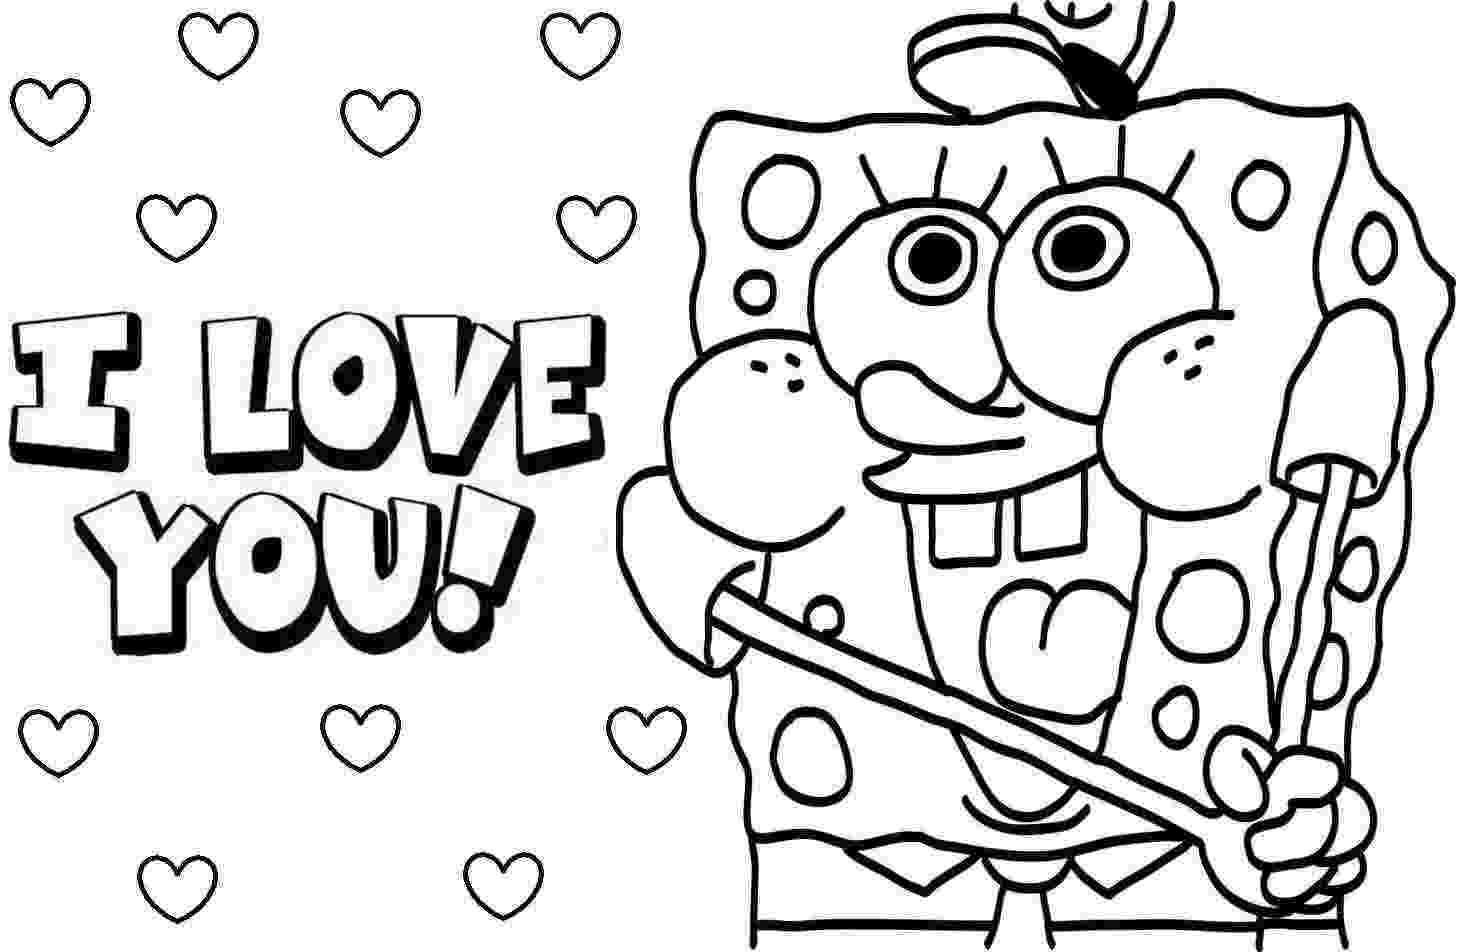 spongebob coloring pages for kids spongebob squarepants coloring pages spongebob coloring spongebob pages kids for coloring